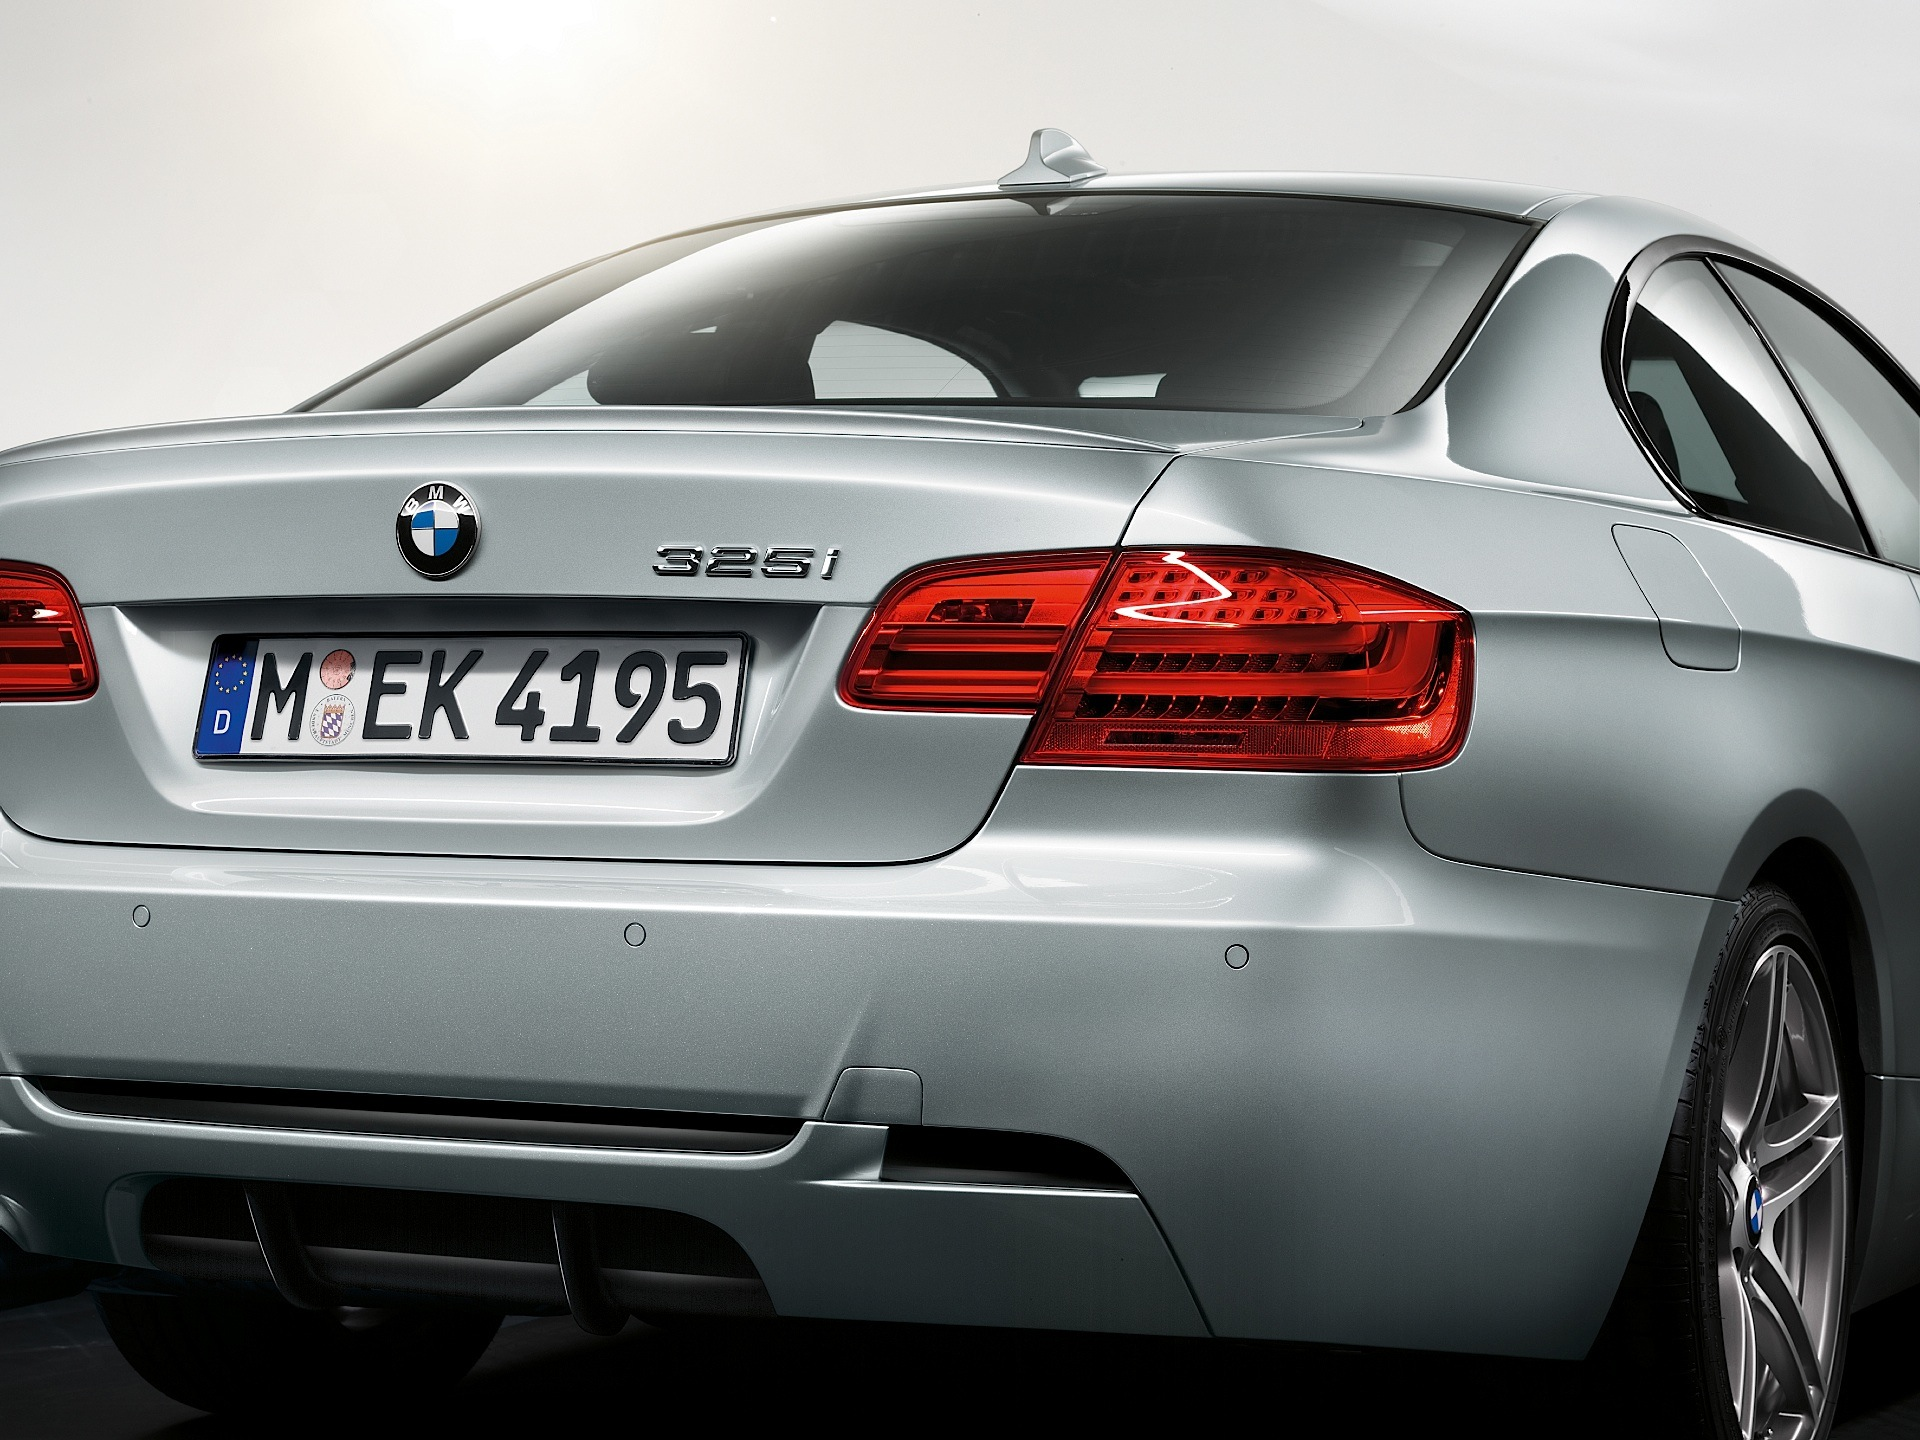 BMW Series Coupe E Specs - Bmw 325i 2011